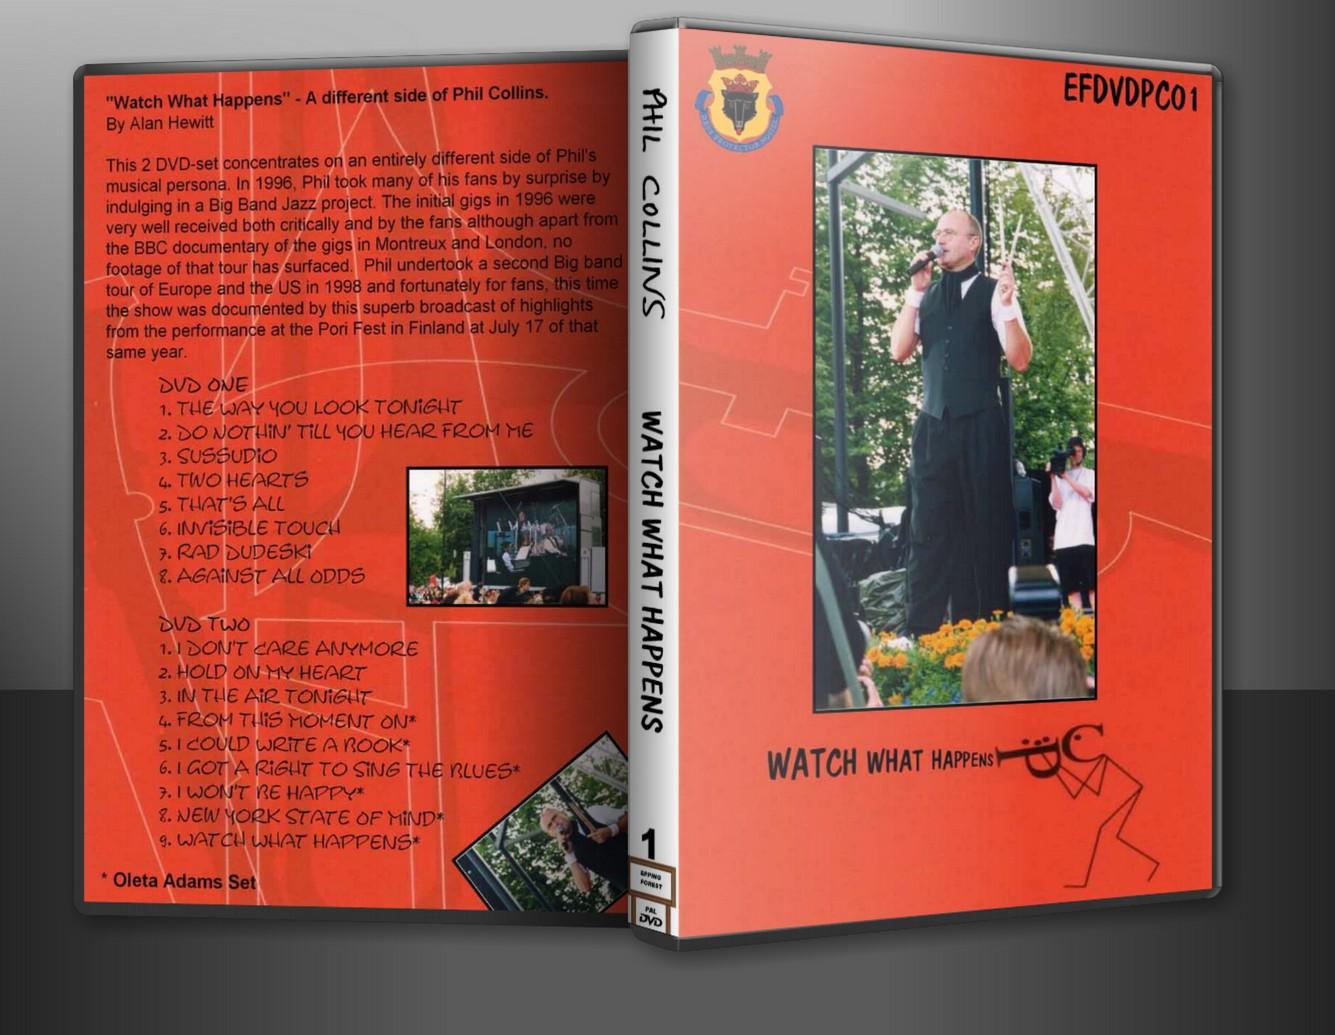 http://1.bp.blogspot.com/-8oaFoEH-rBw/UAf9lJsej6I/AAAAAAAAGxk/VyT8hTMpqM0/s1600/DVD+For+Show+-+Phil+Collins+Big+Band+-+1988+-+Watch+What+Happens+.jpg